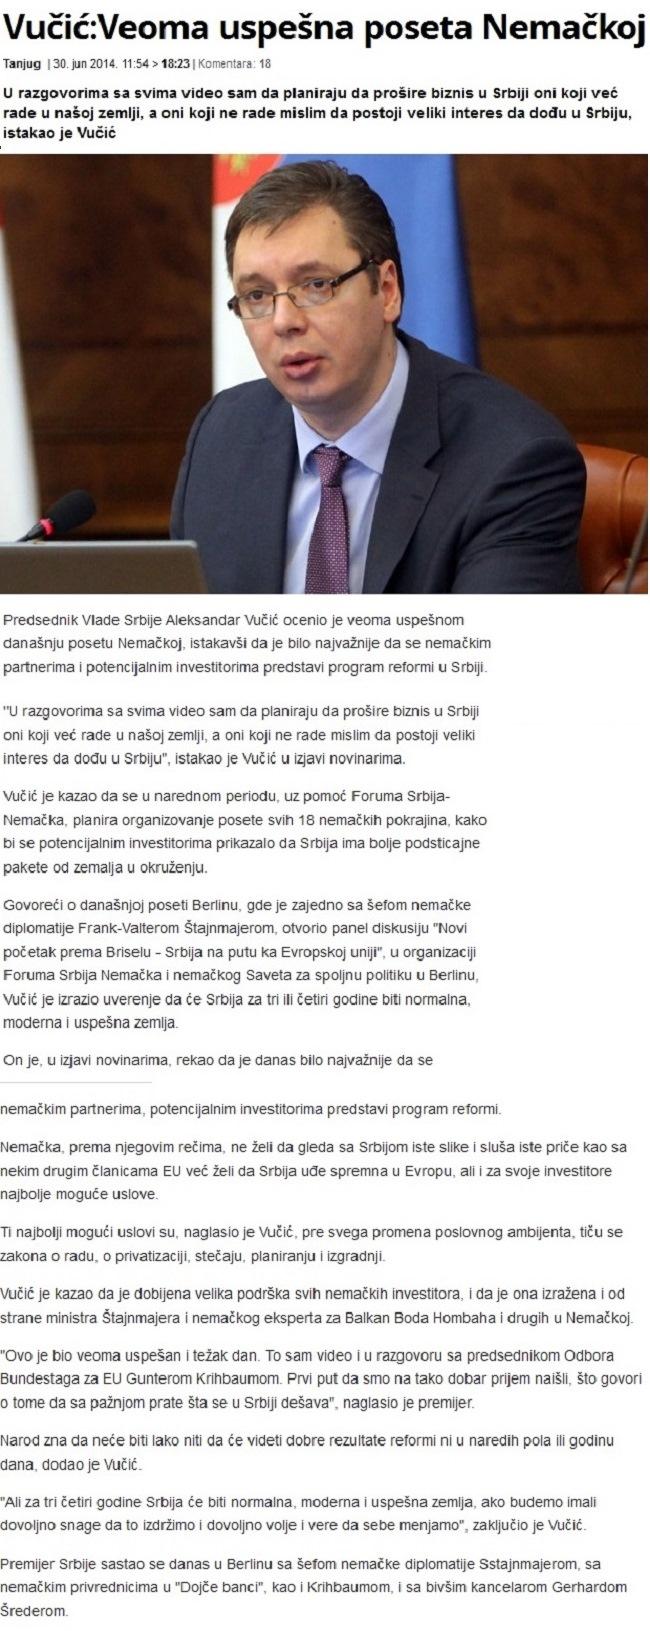 screenshot-www novosti rs 2014-06-30 18-55-39